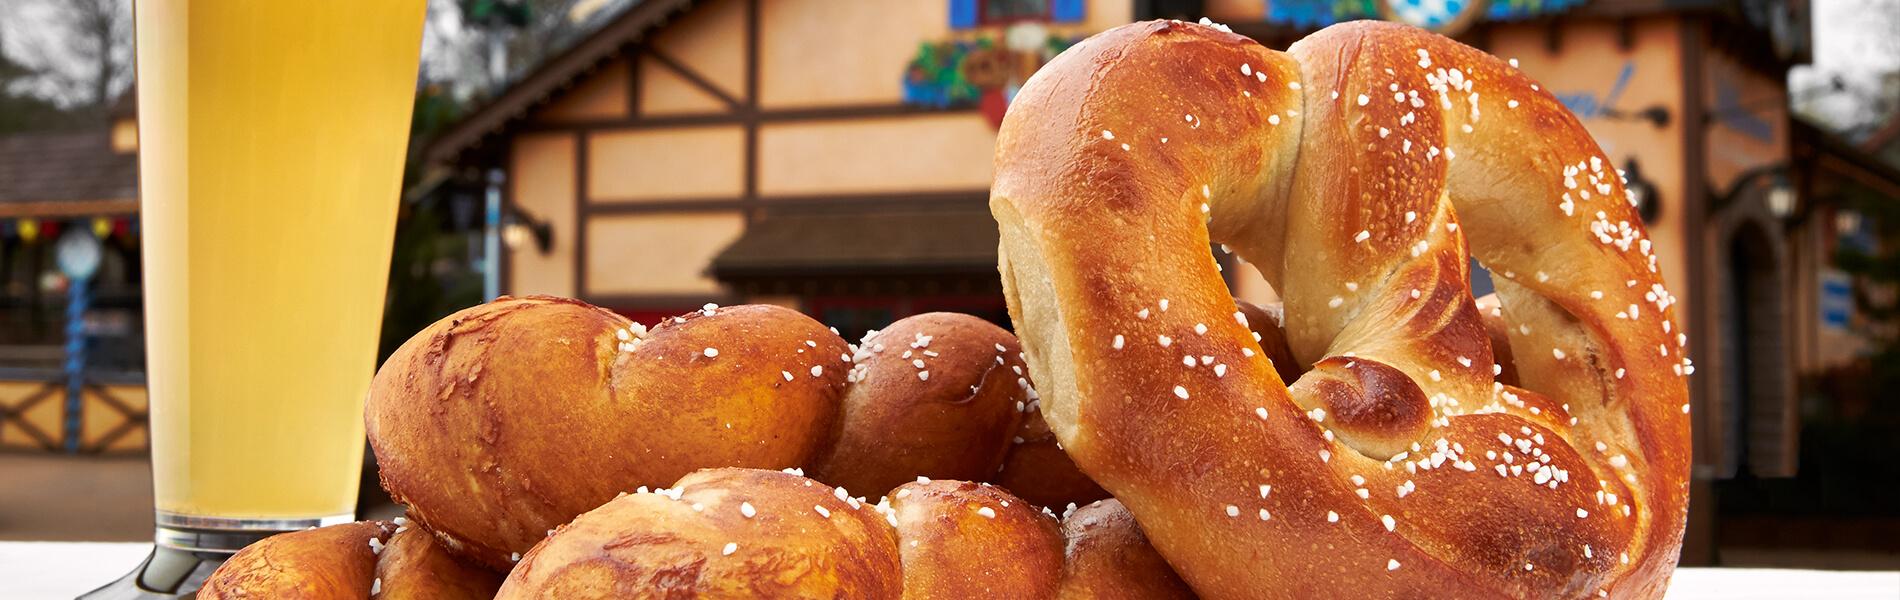 Enjoy hand-rolled pretzels plus a selection of German, craft & seasonal beers.